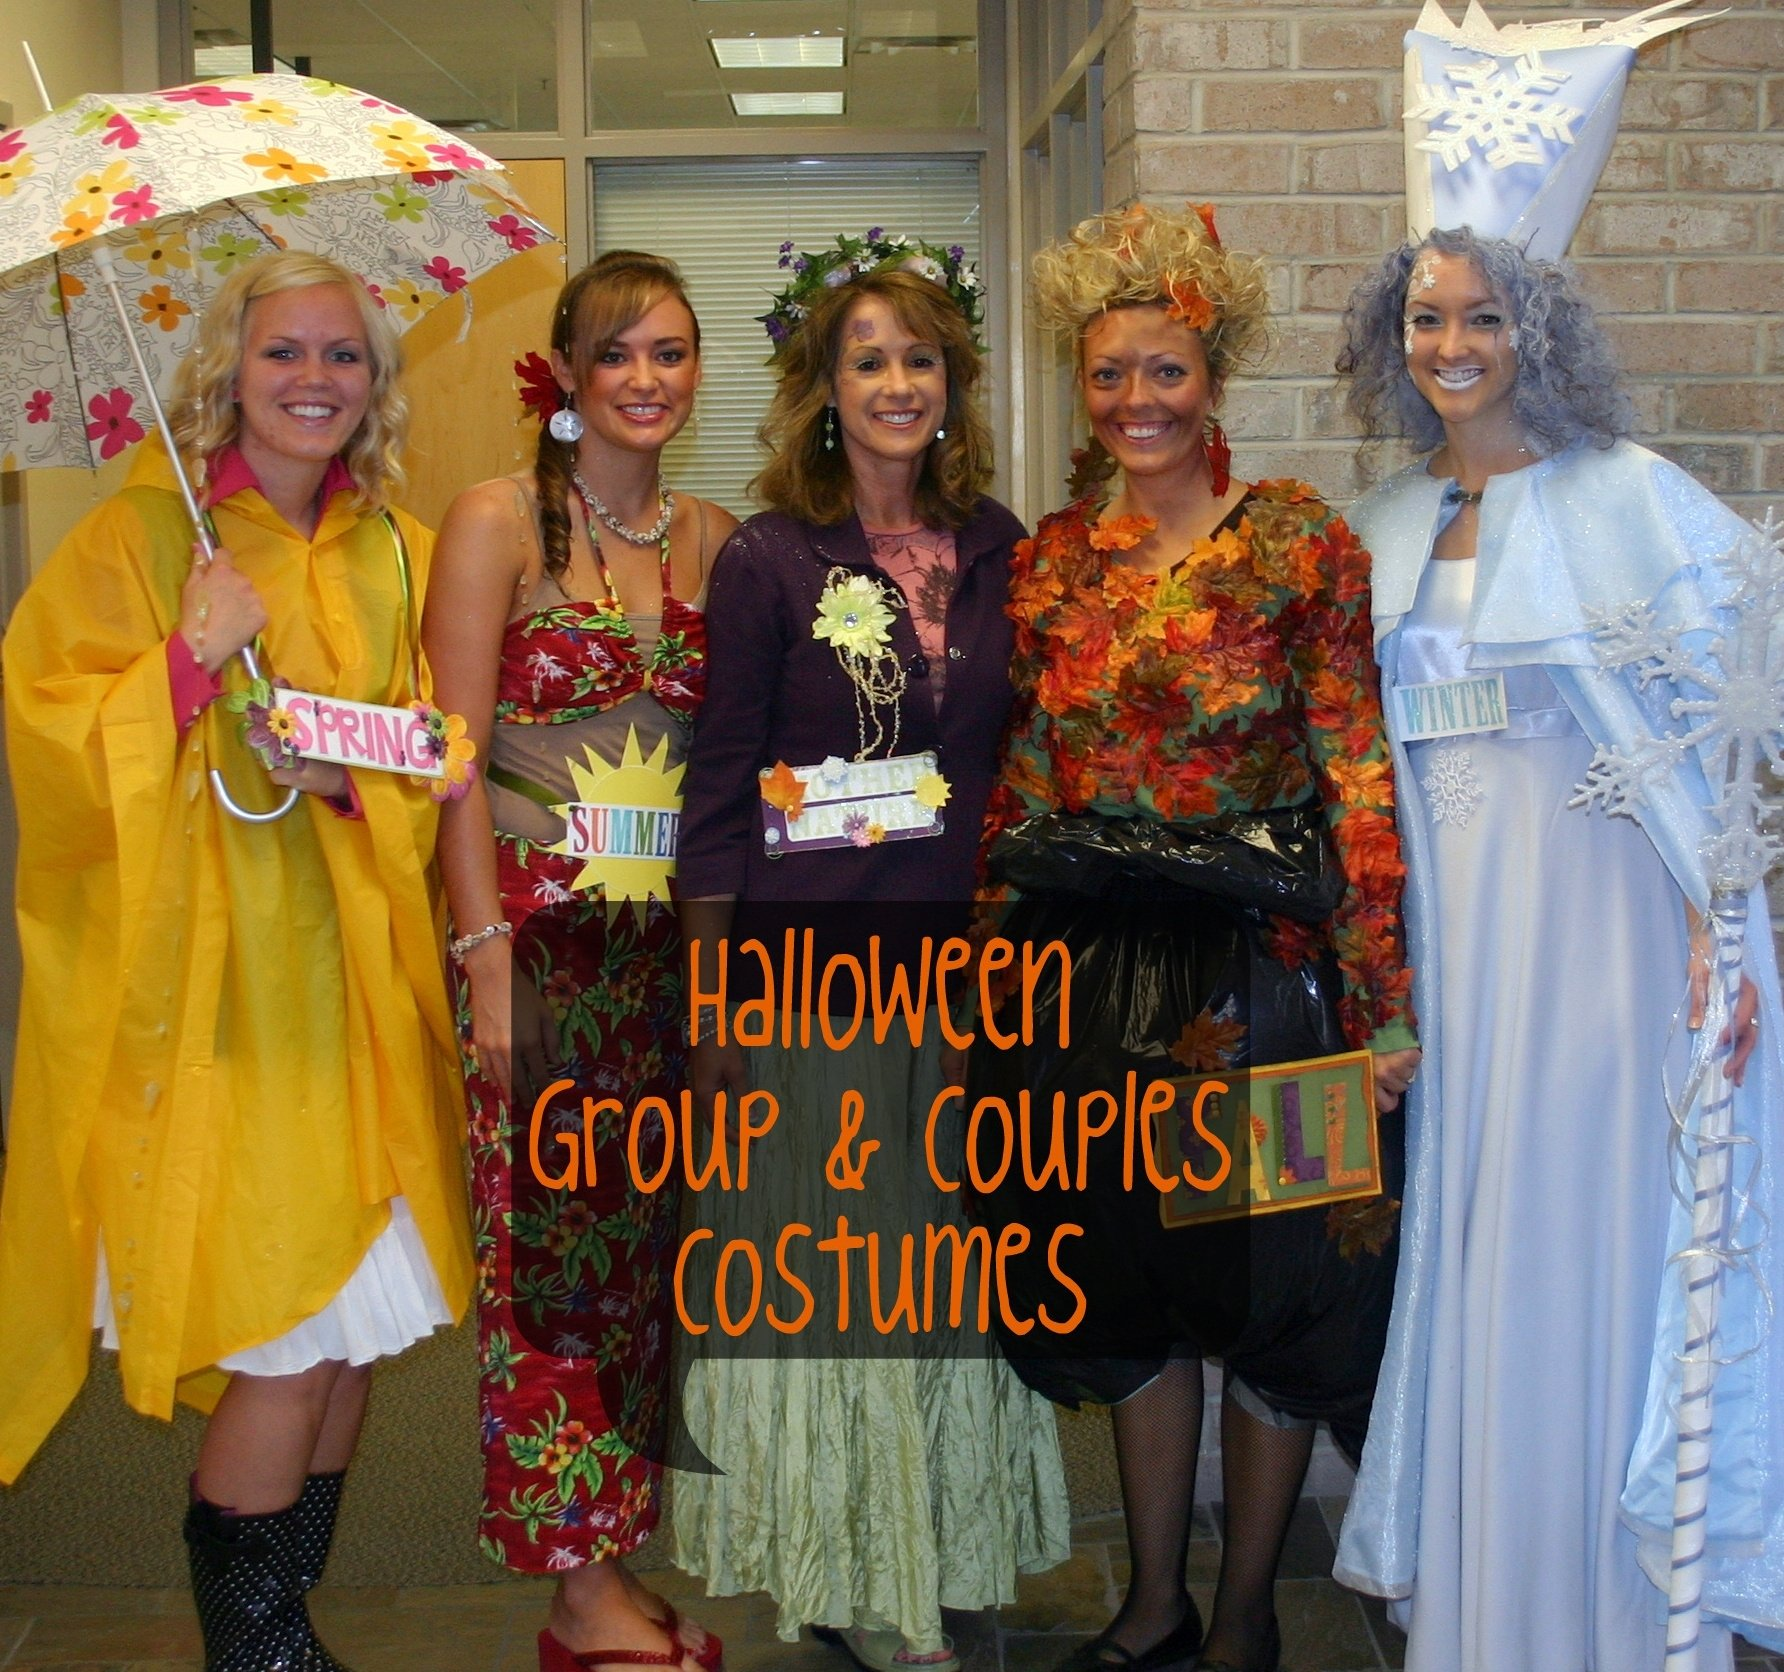 10 Gorgeous Halloween Costume Ideas For Groups fun group and couples halloween costume ideas 30 days of halloween 2 2020